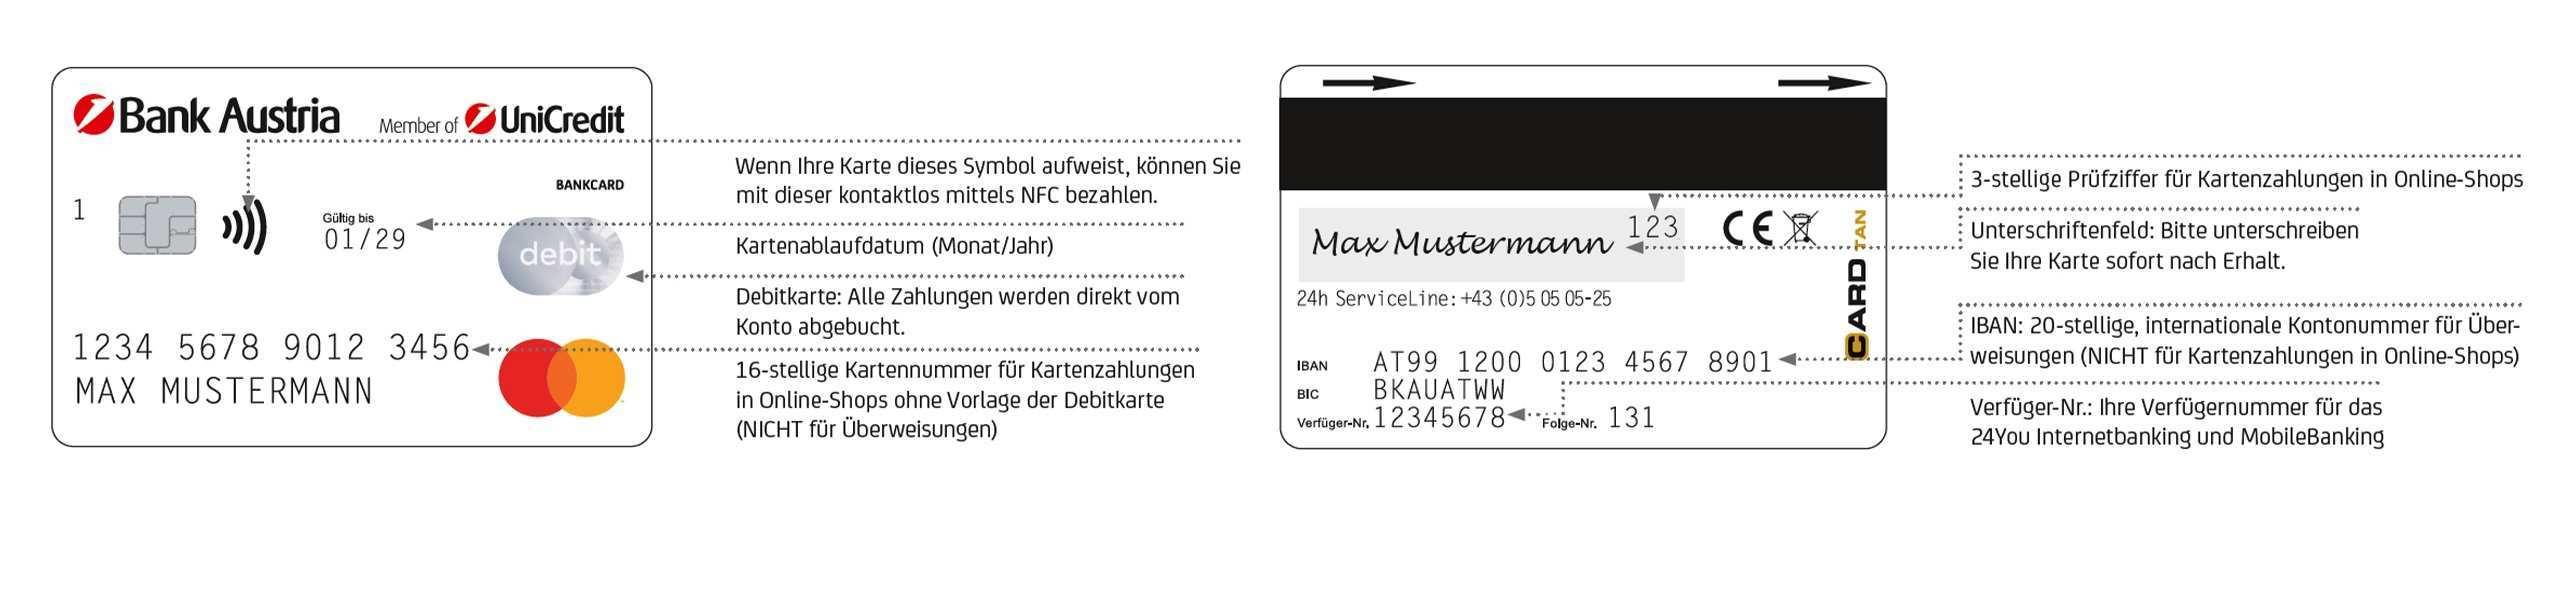 Debitkarte Die Bankcard Der Bank Austria Bank Austria